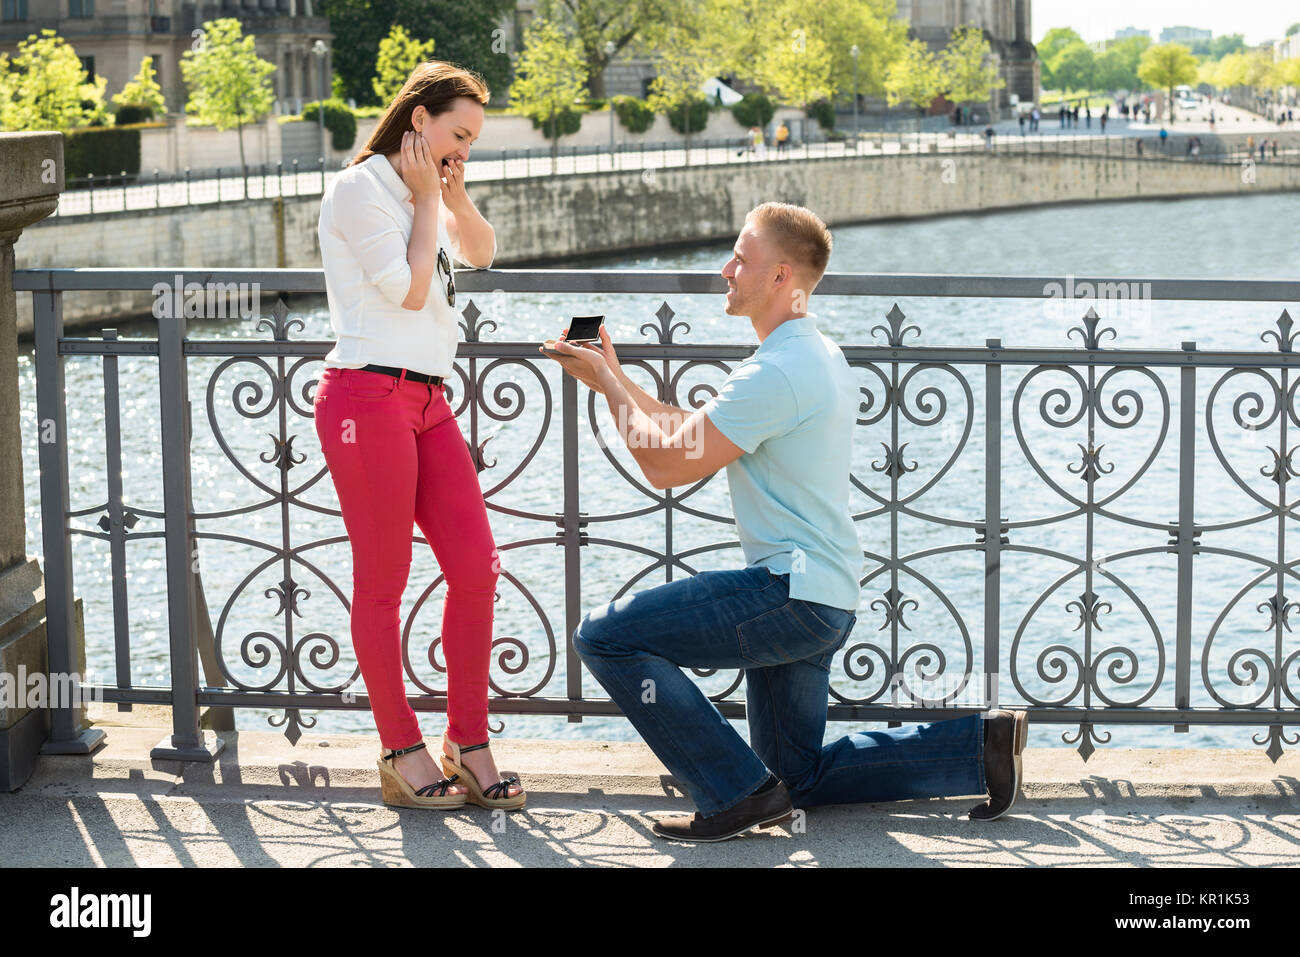 Man With Ring Making Proposal - Stock Image